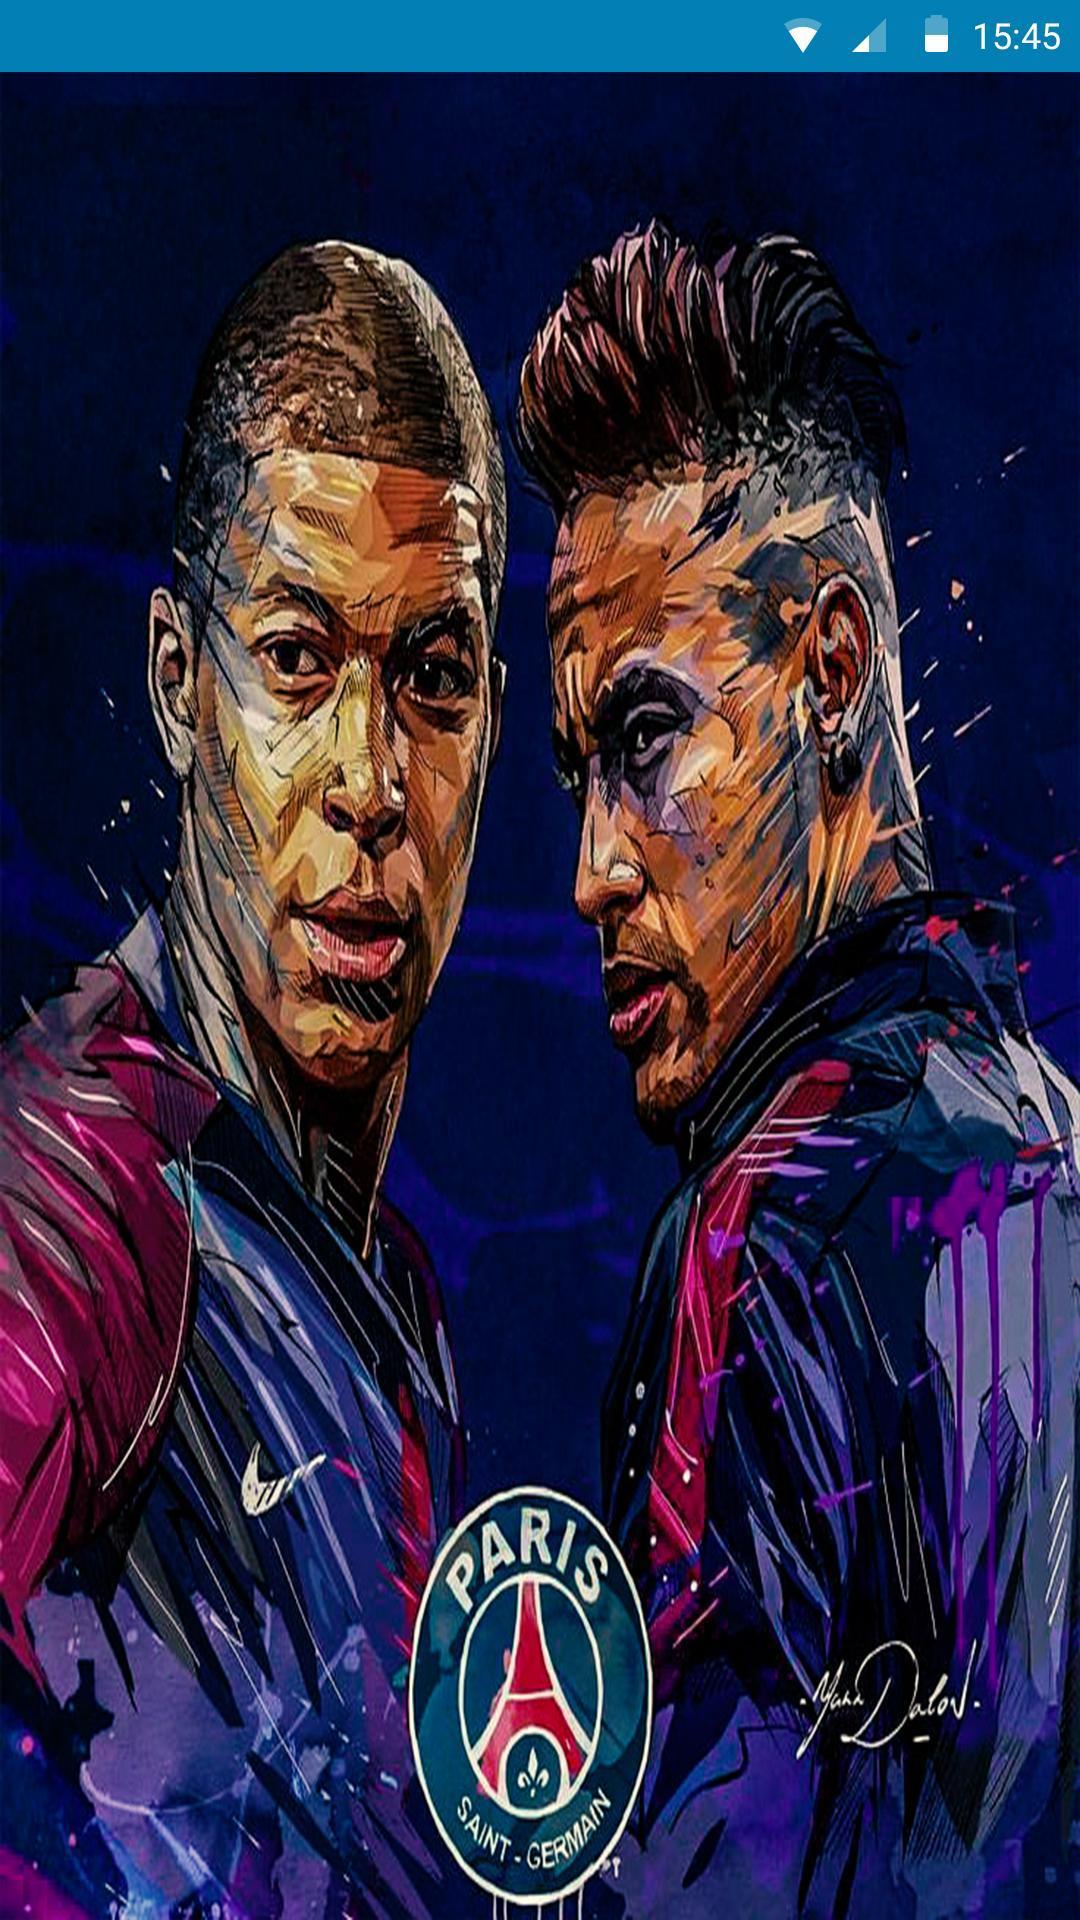 Neymar Jr Wallpaper Hd For Android Apk Download